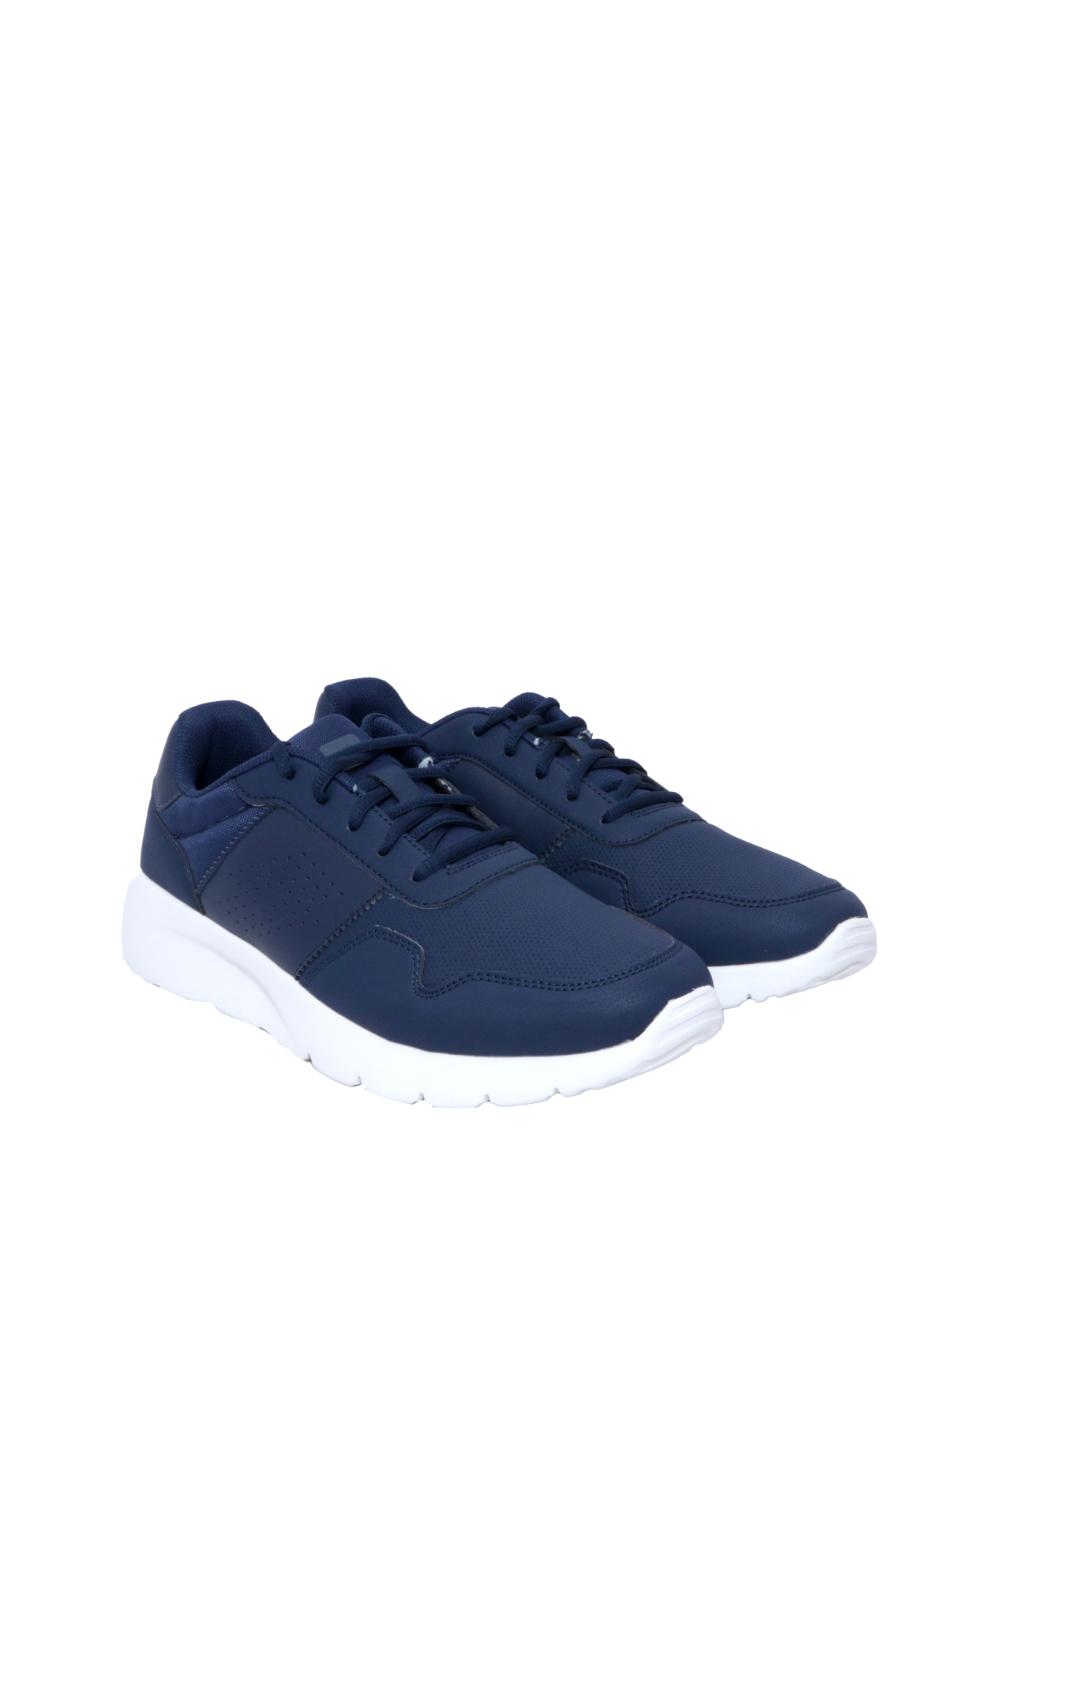 Lotto | Lotto Men's Megalight Ultra Iii Dress Blue/Winter Blue Mtl Training Shoes